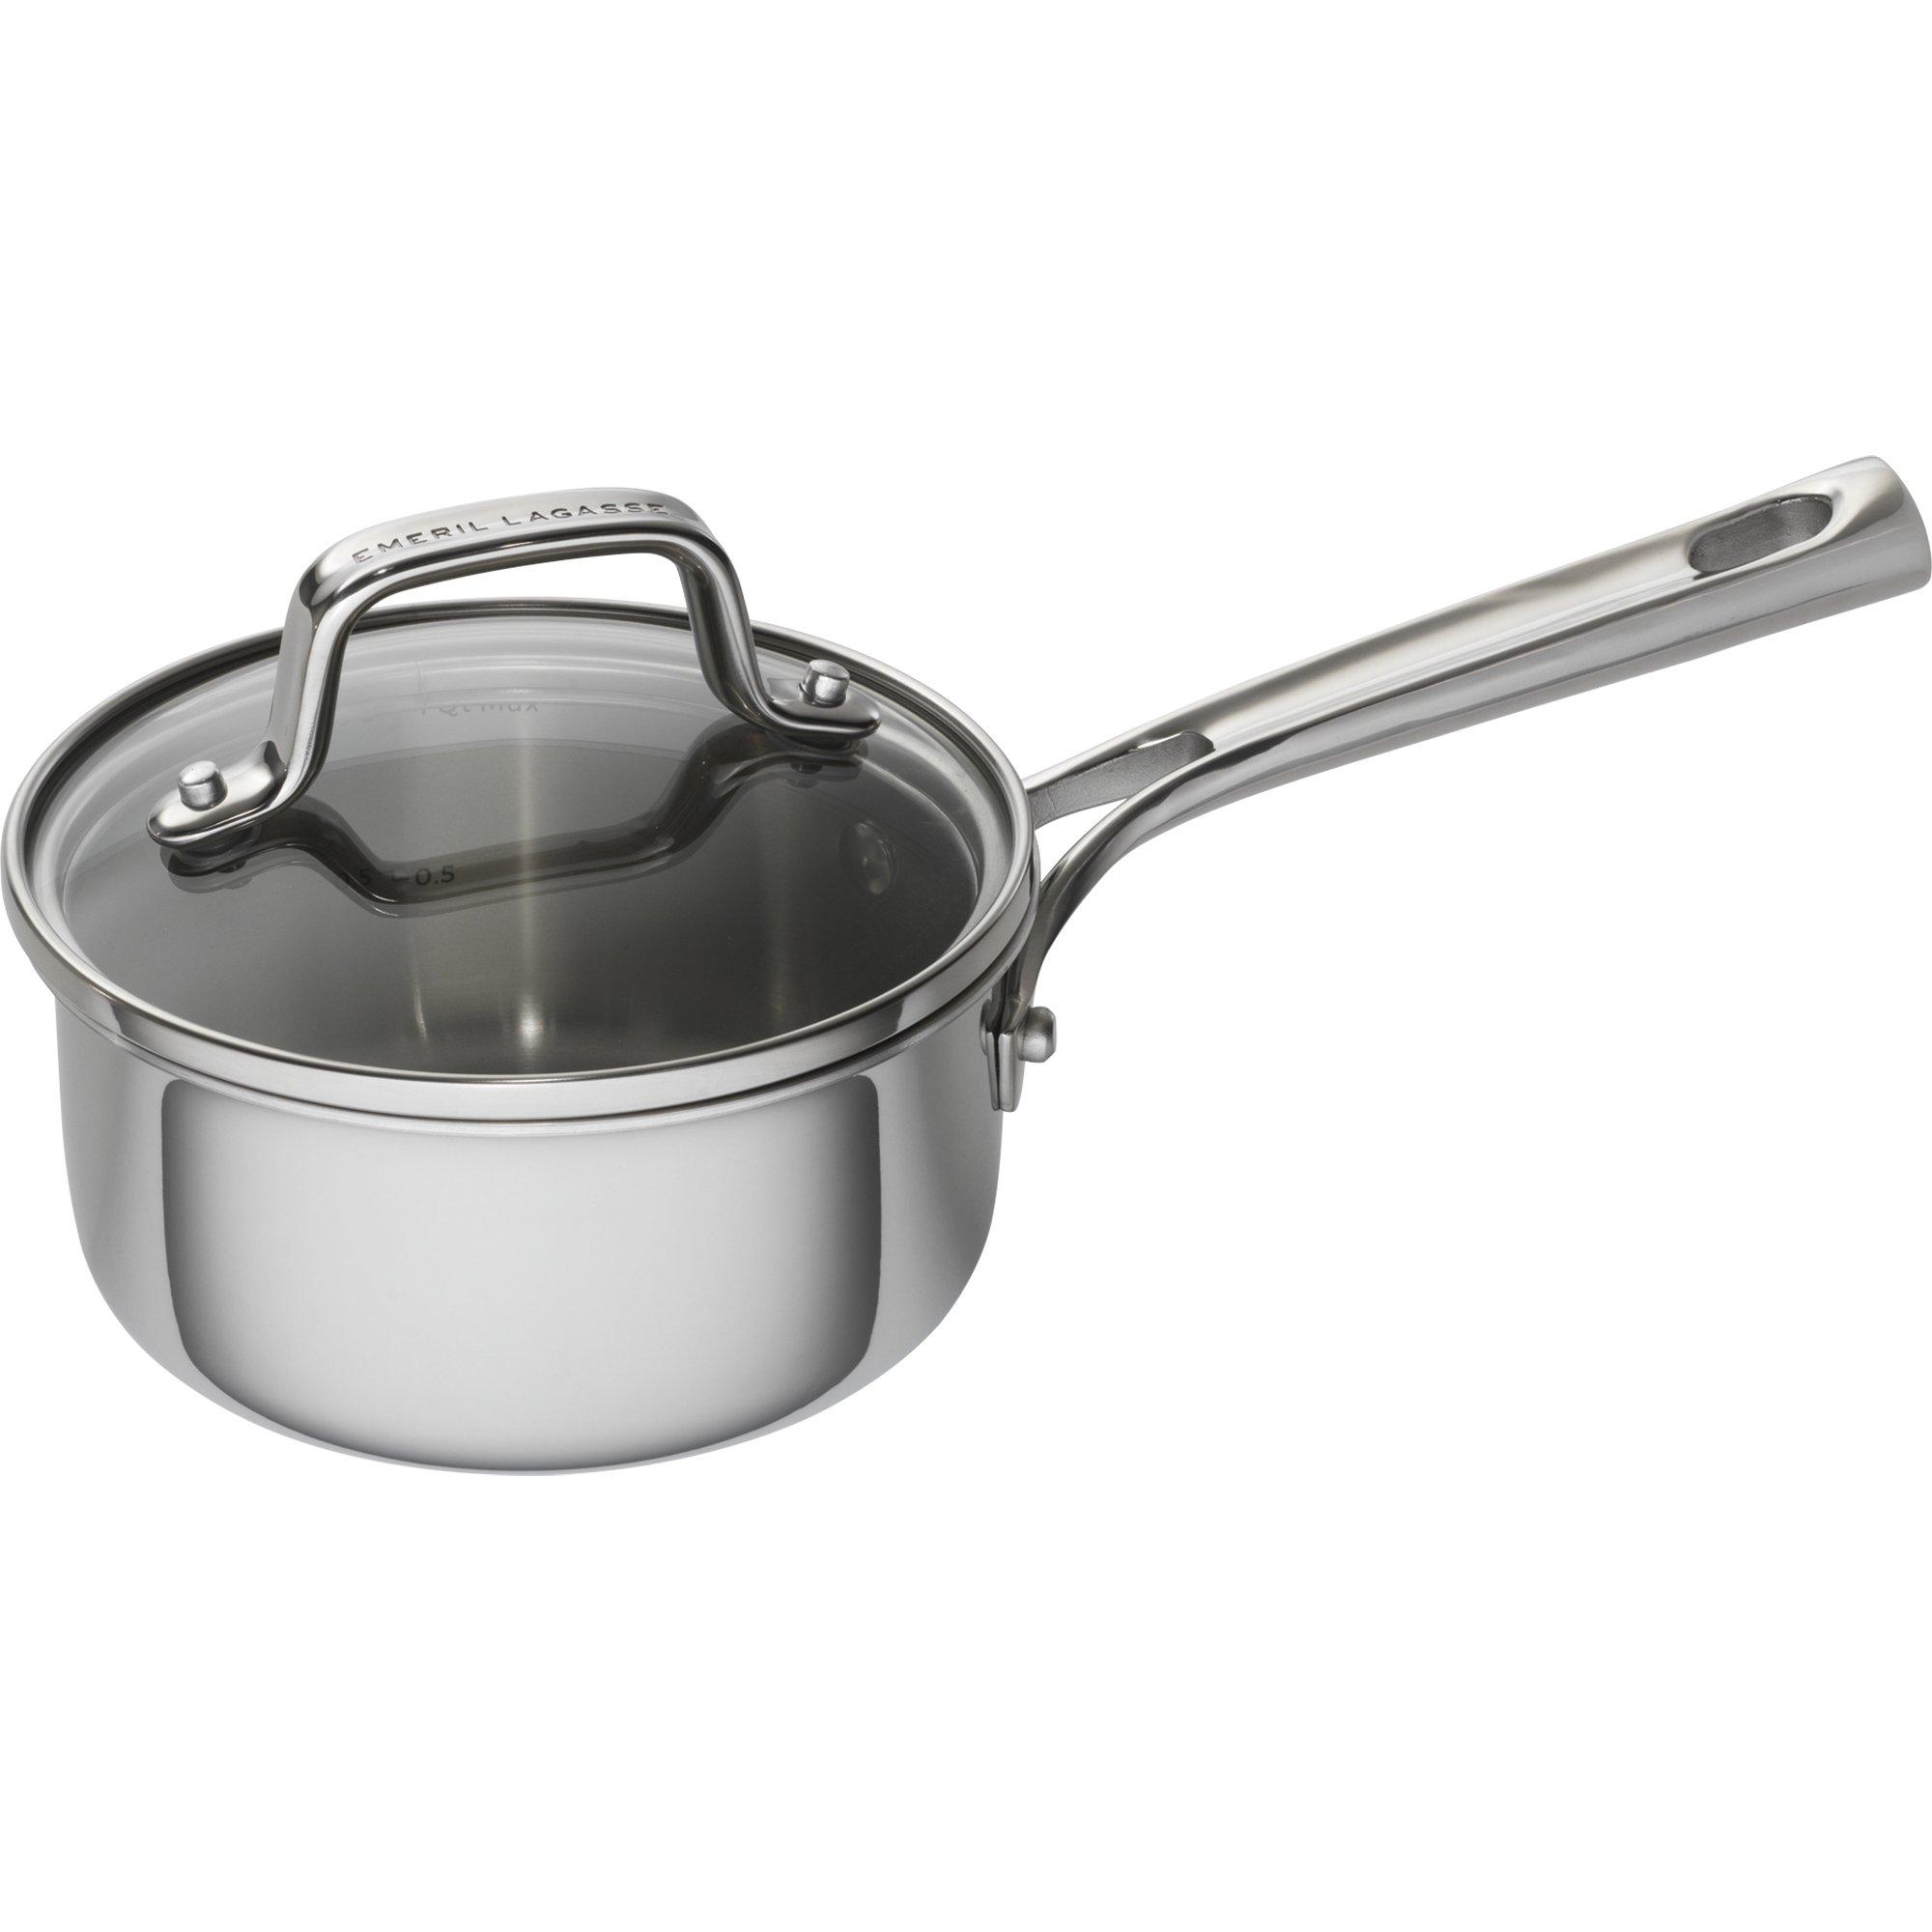 Emeril Lagasse 62854 Tri-Ply Stainless Steel Saucepan, 1 quart, Silver